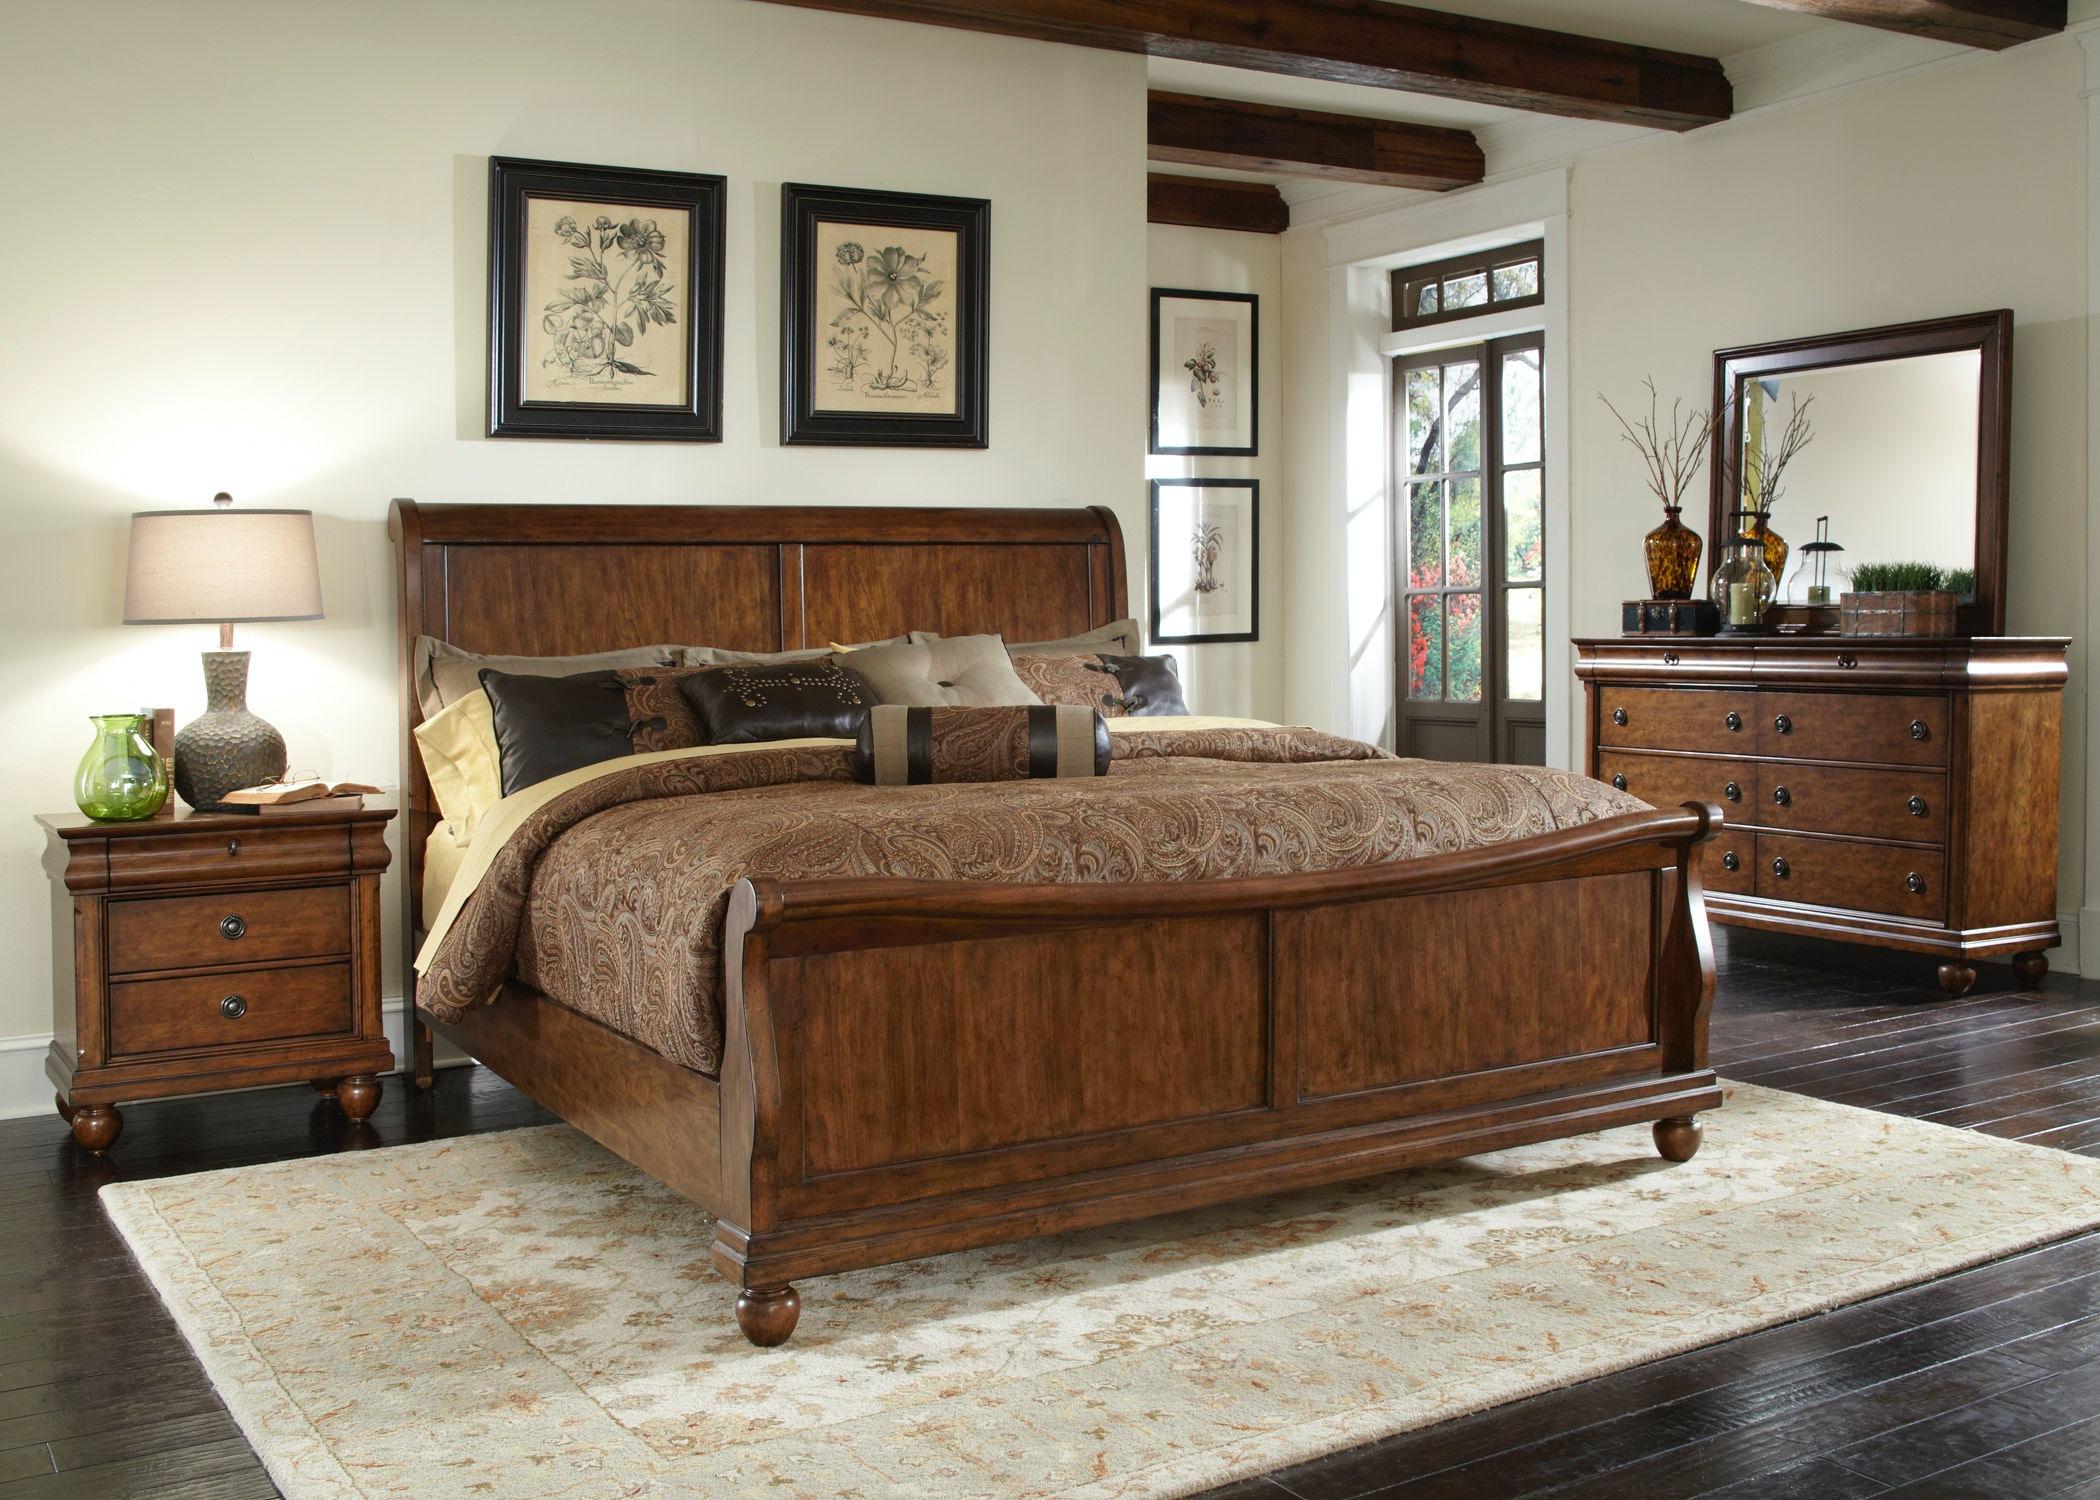 Incroyable Liberty Furniture Bedroom King Sleigh Footboard And Slats 589 BR22F At Kiser  Furniture